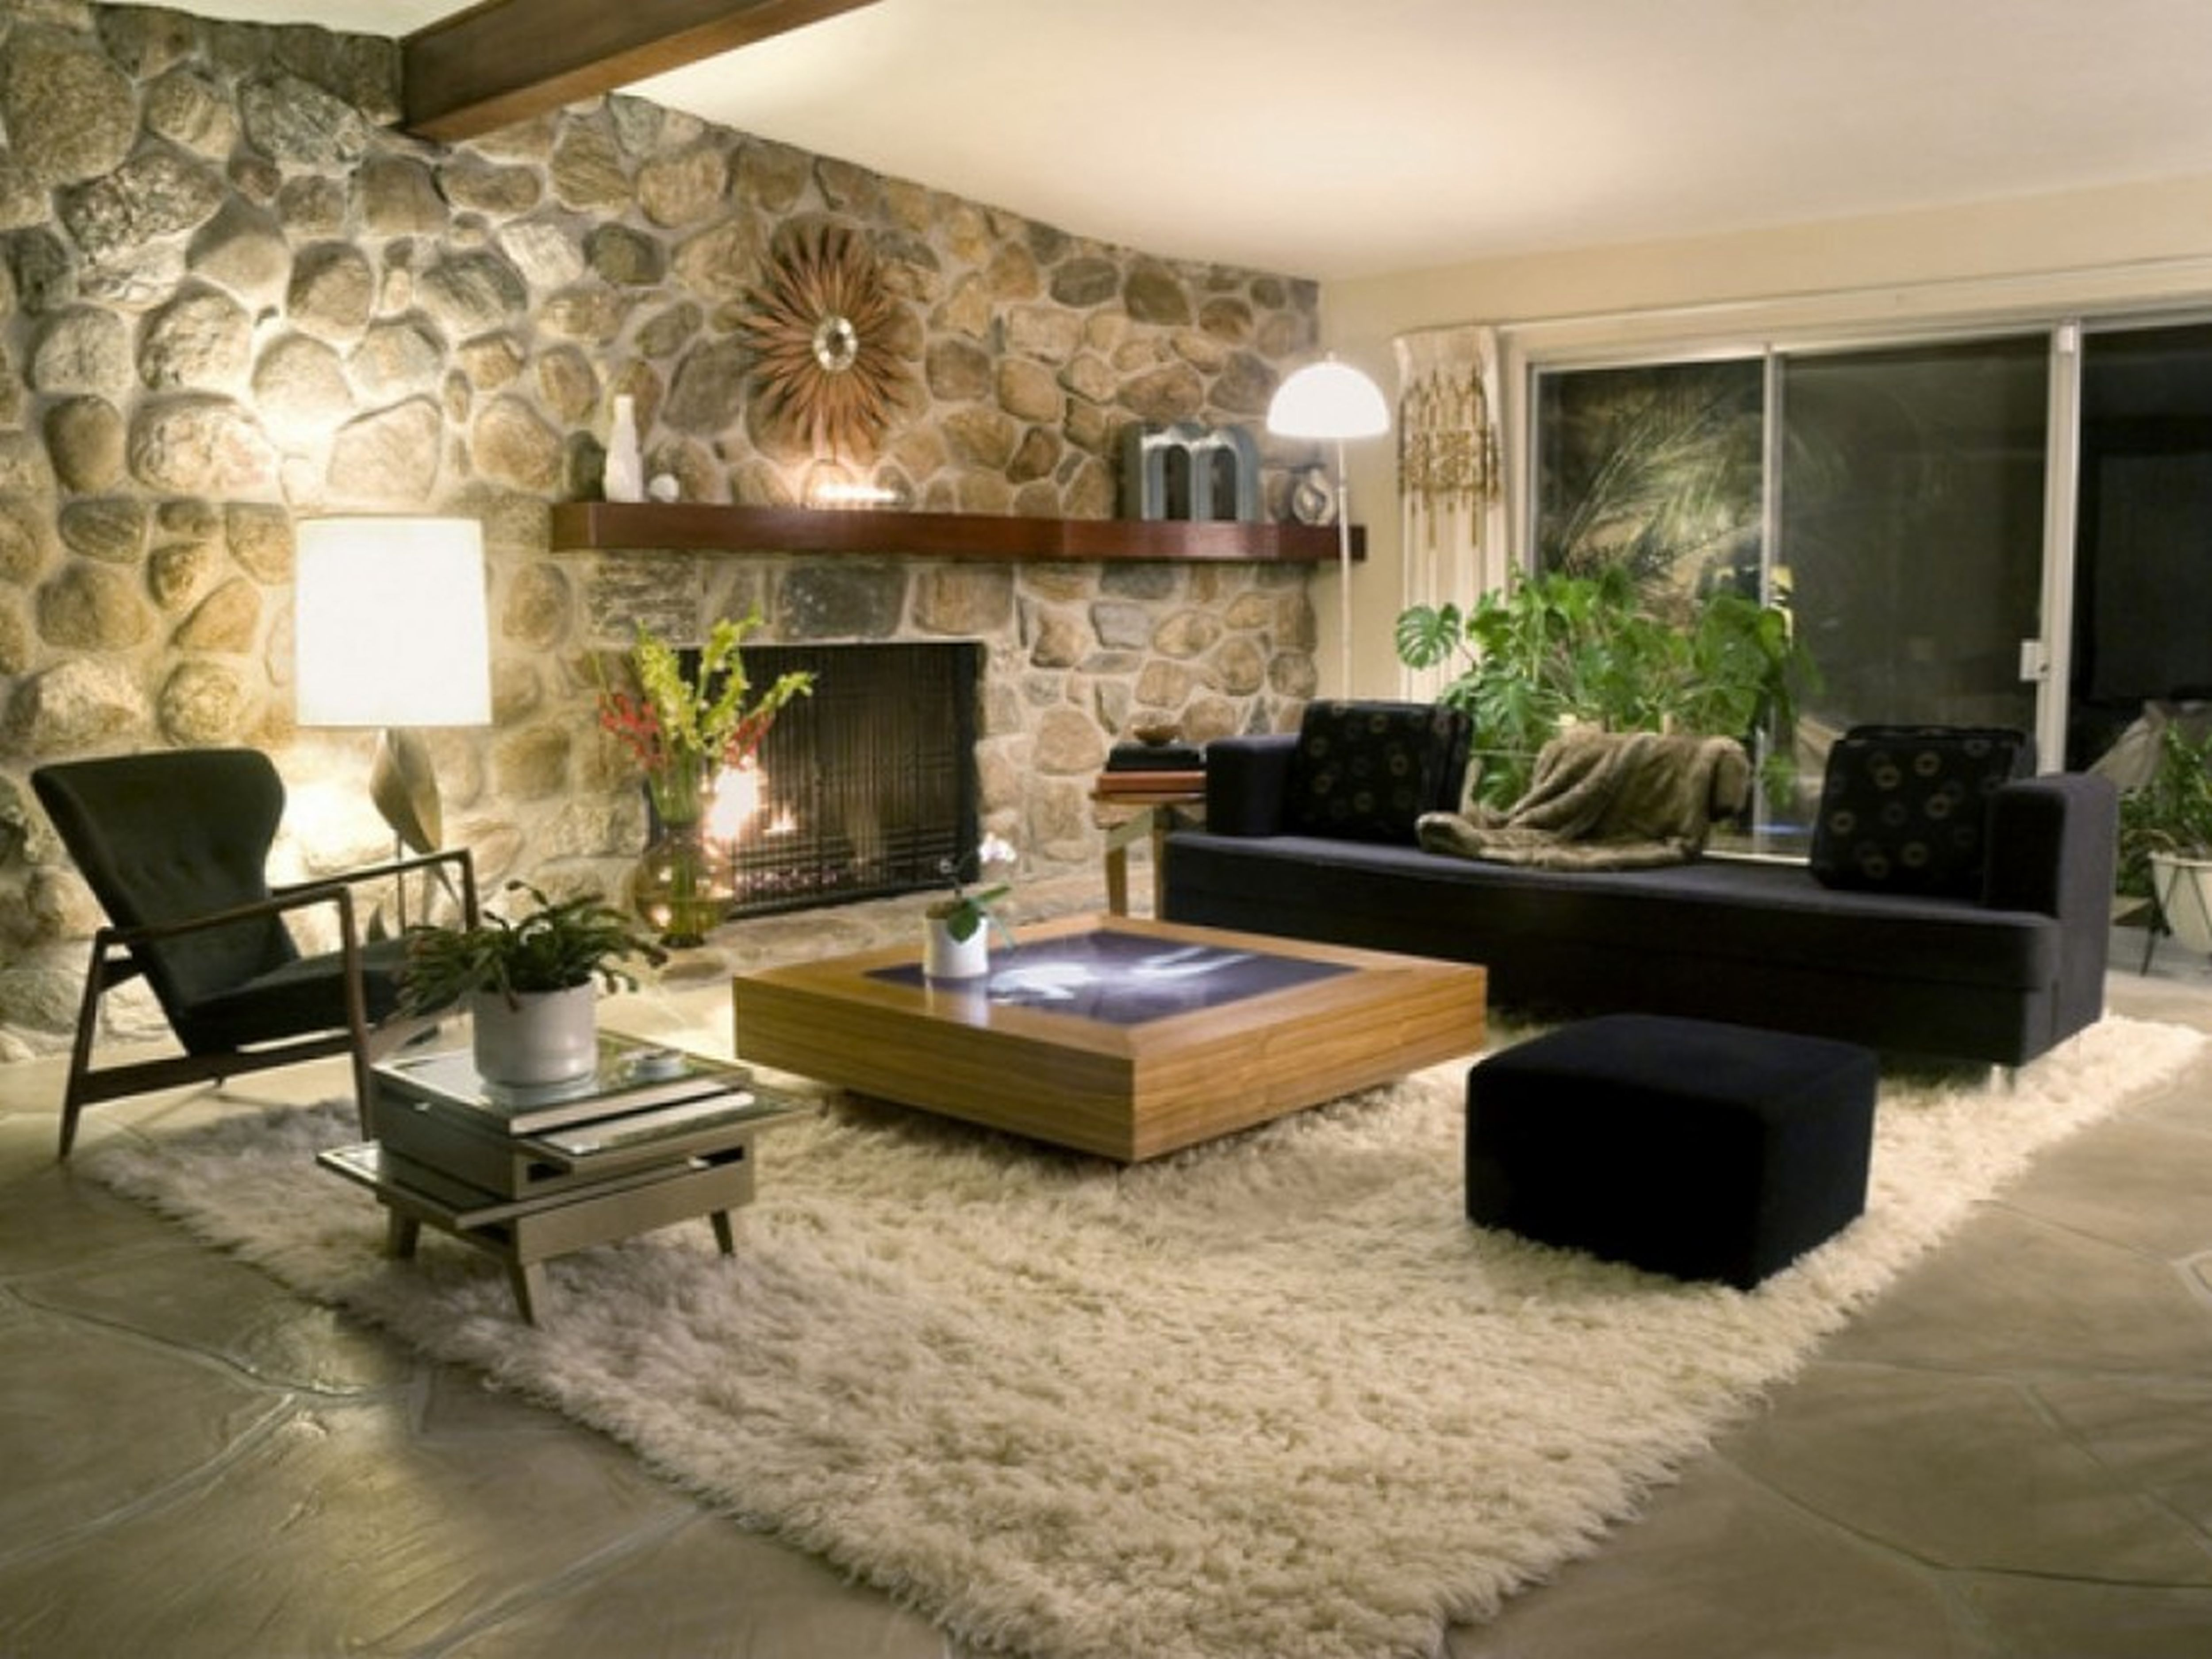 25 Modern Living Room Decor Ideas – The WoW Style